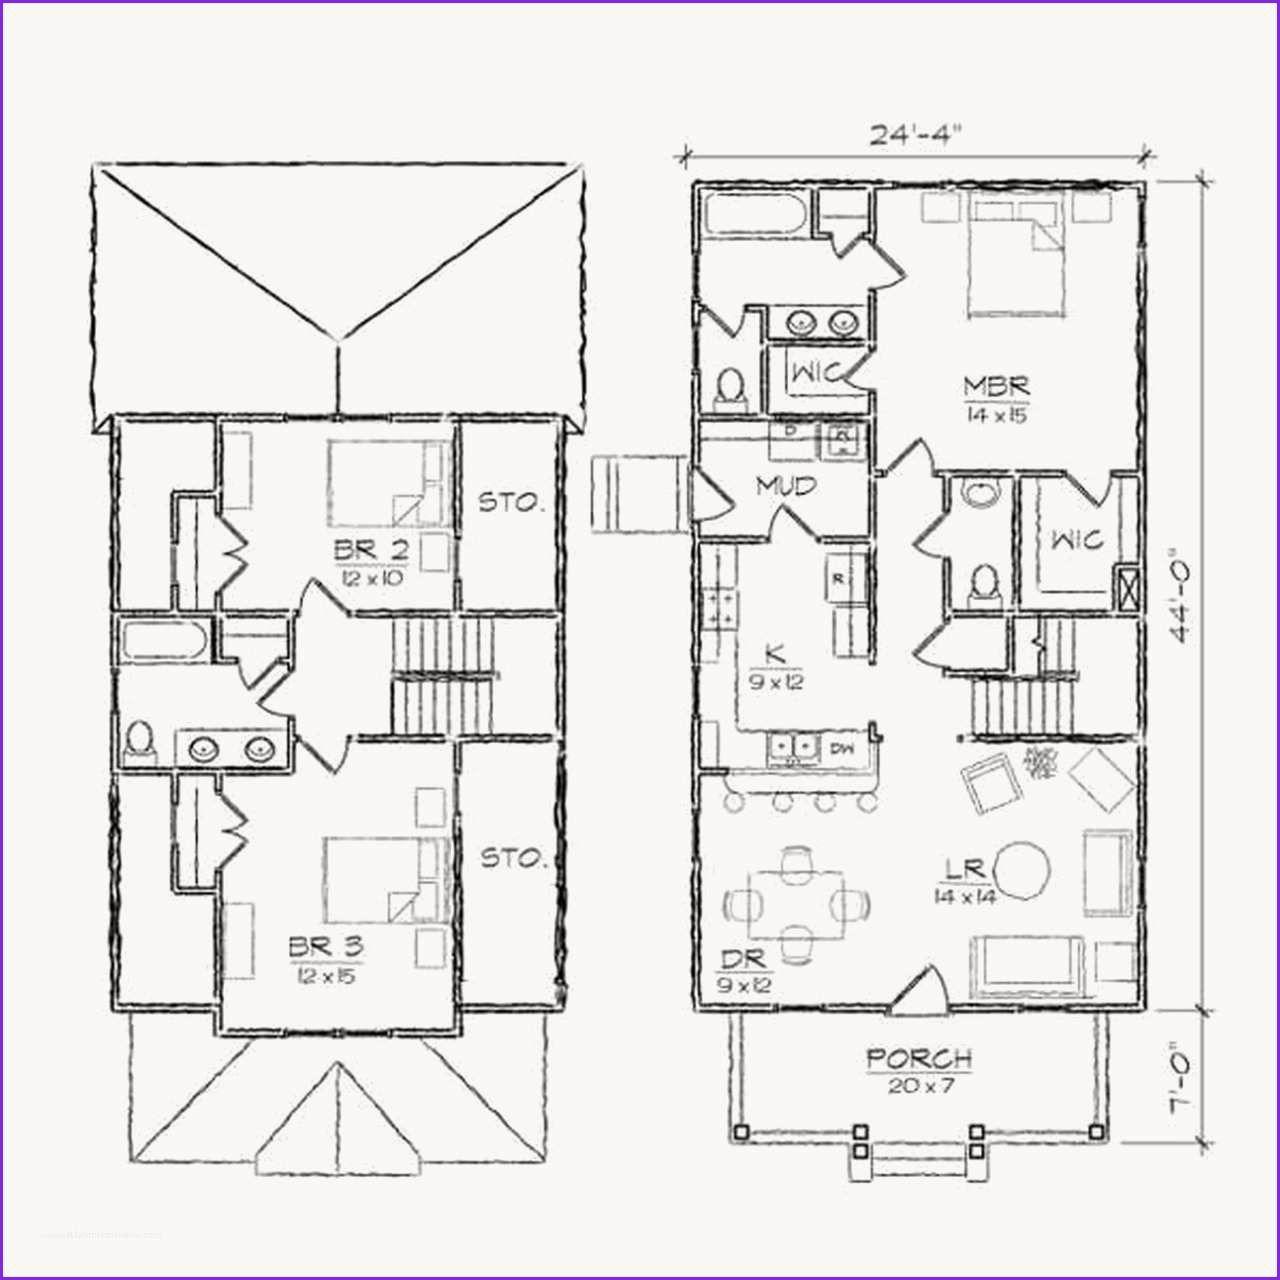 Awesome House Plans Walkout Basement House Plans Walkout ...